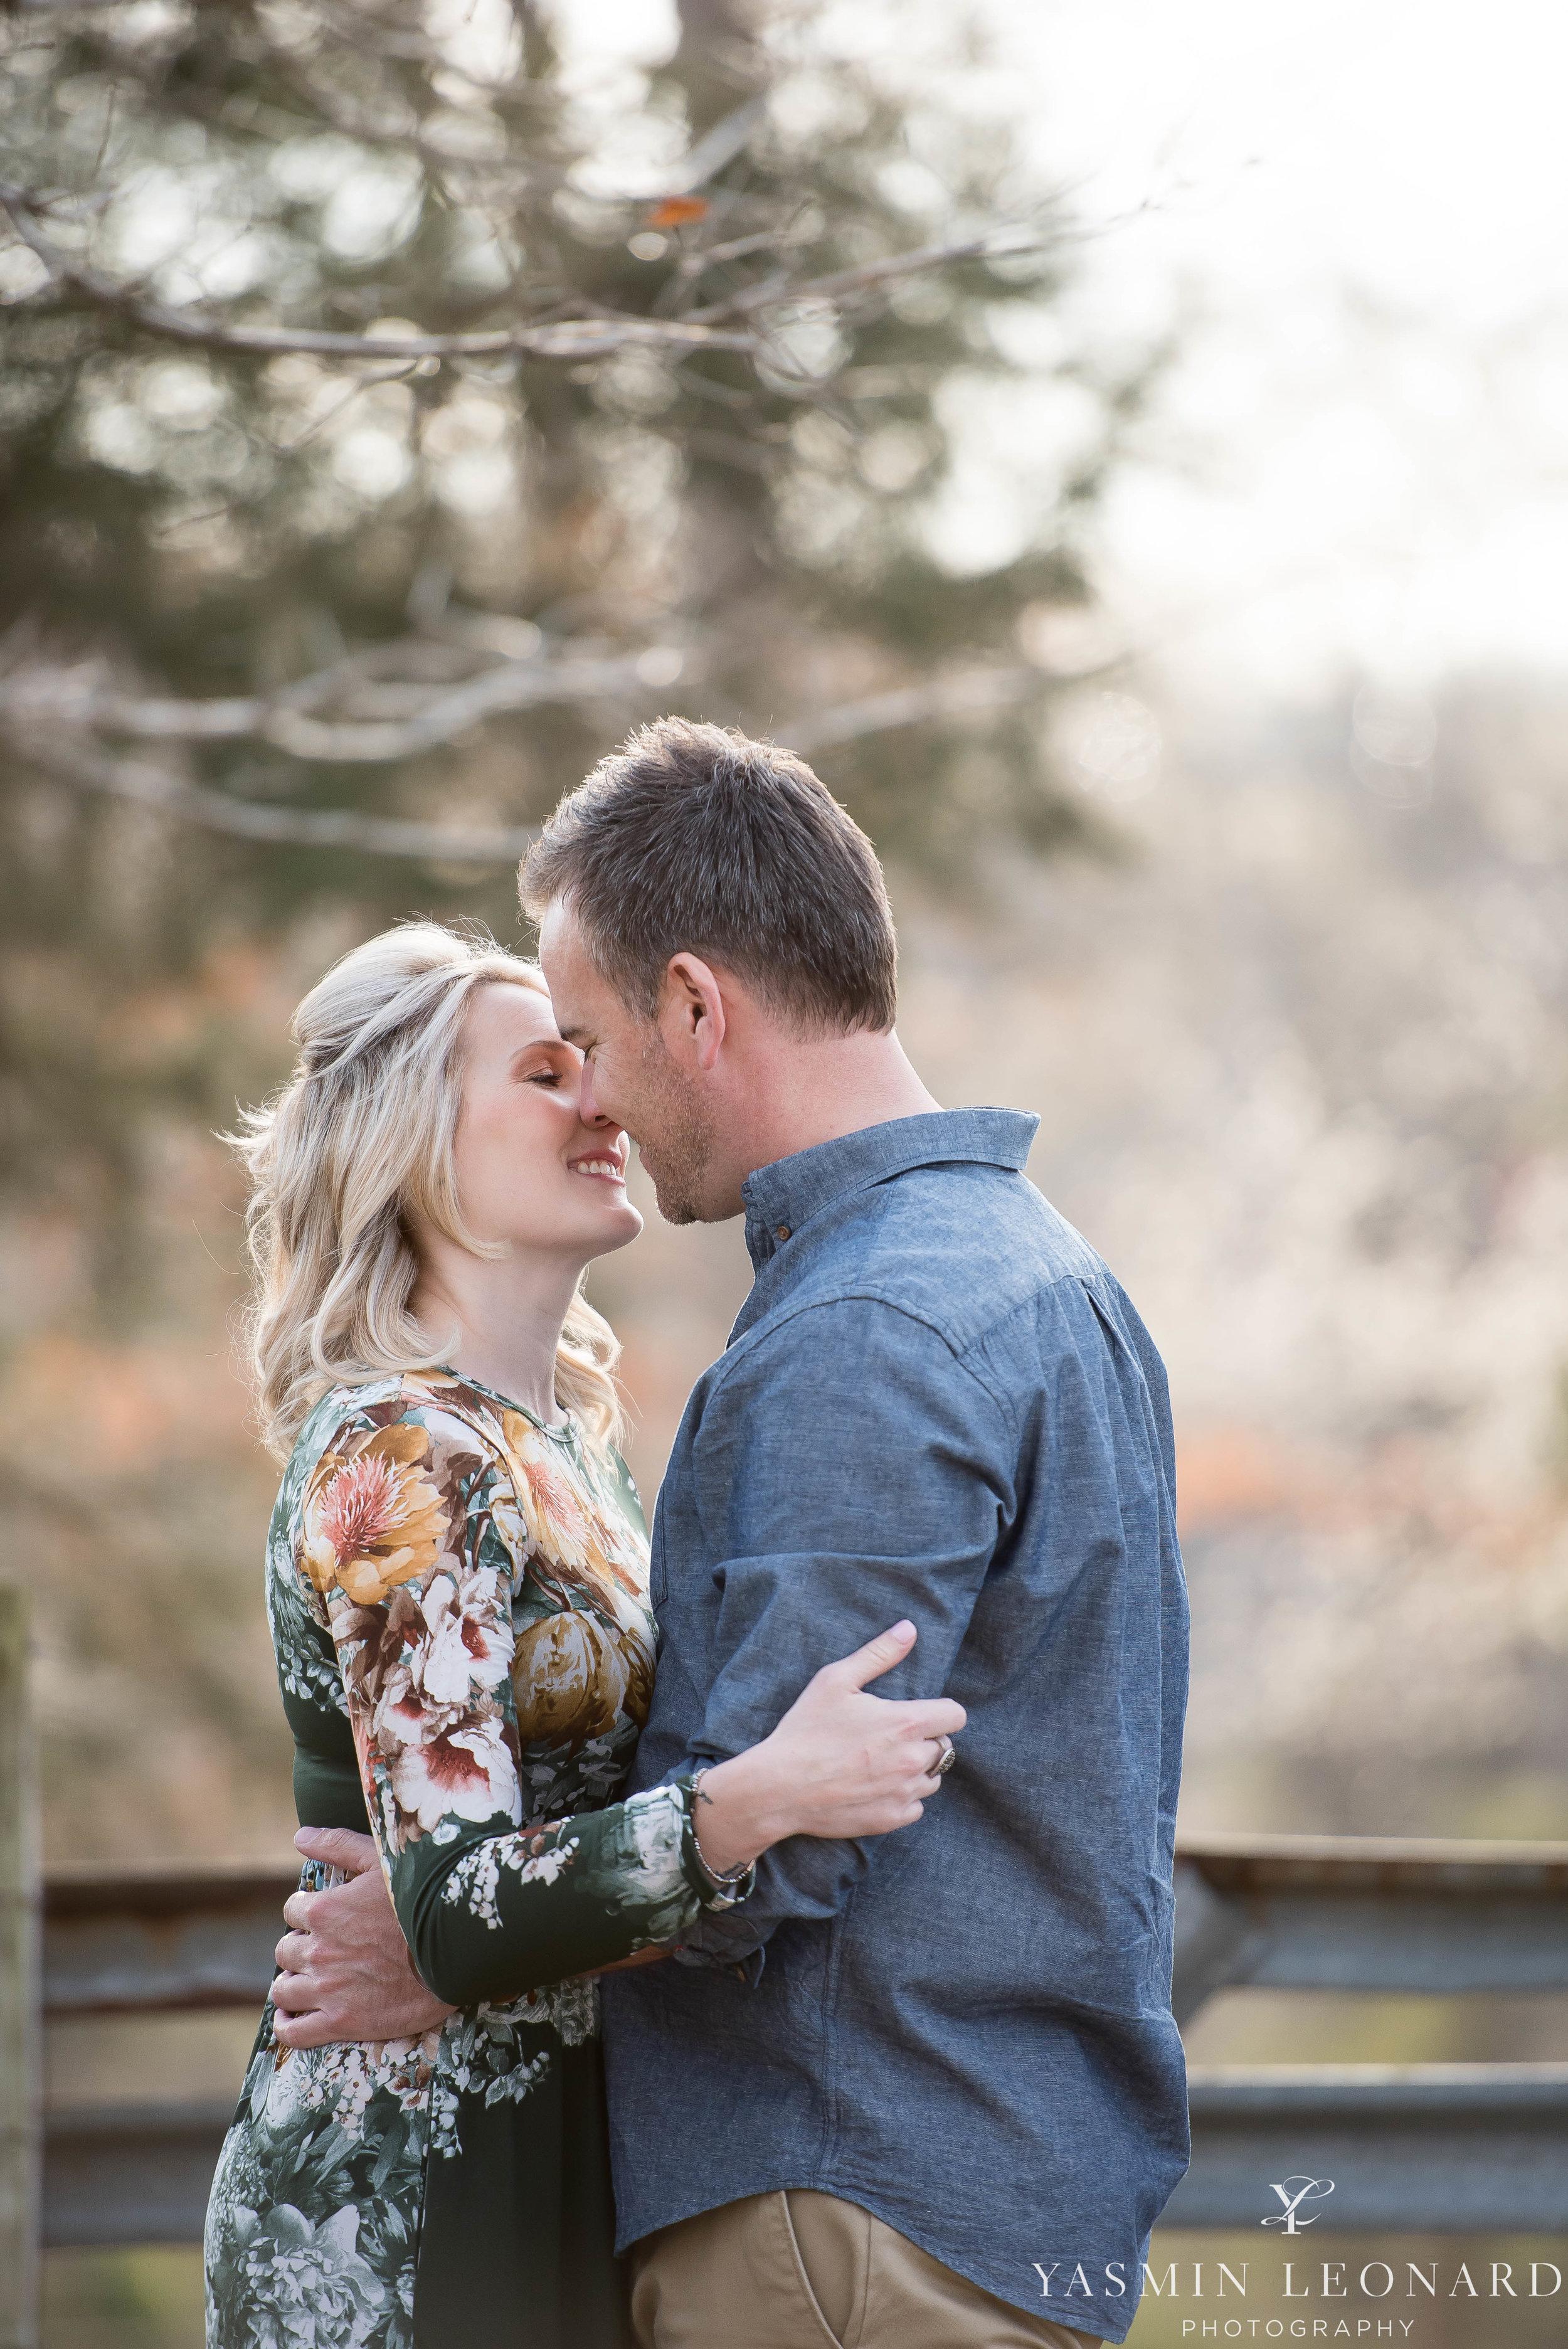 High Point Wedding Photographer - NC Wedding Photographer - Yasmin Leonard Photography - Engagement Poses - Engagement Ideas - Outdoor Engagement Session-4.jpg